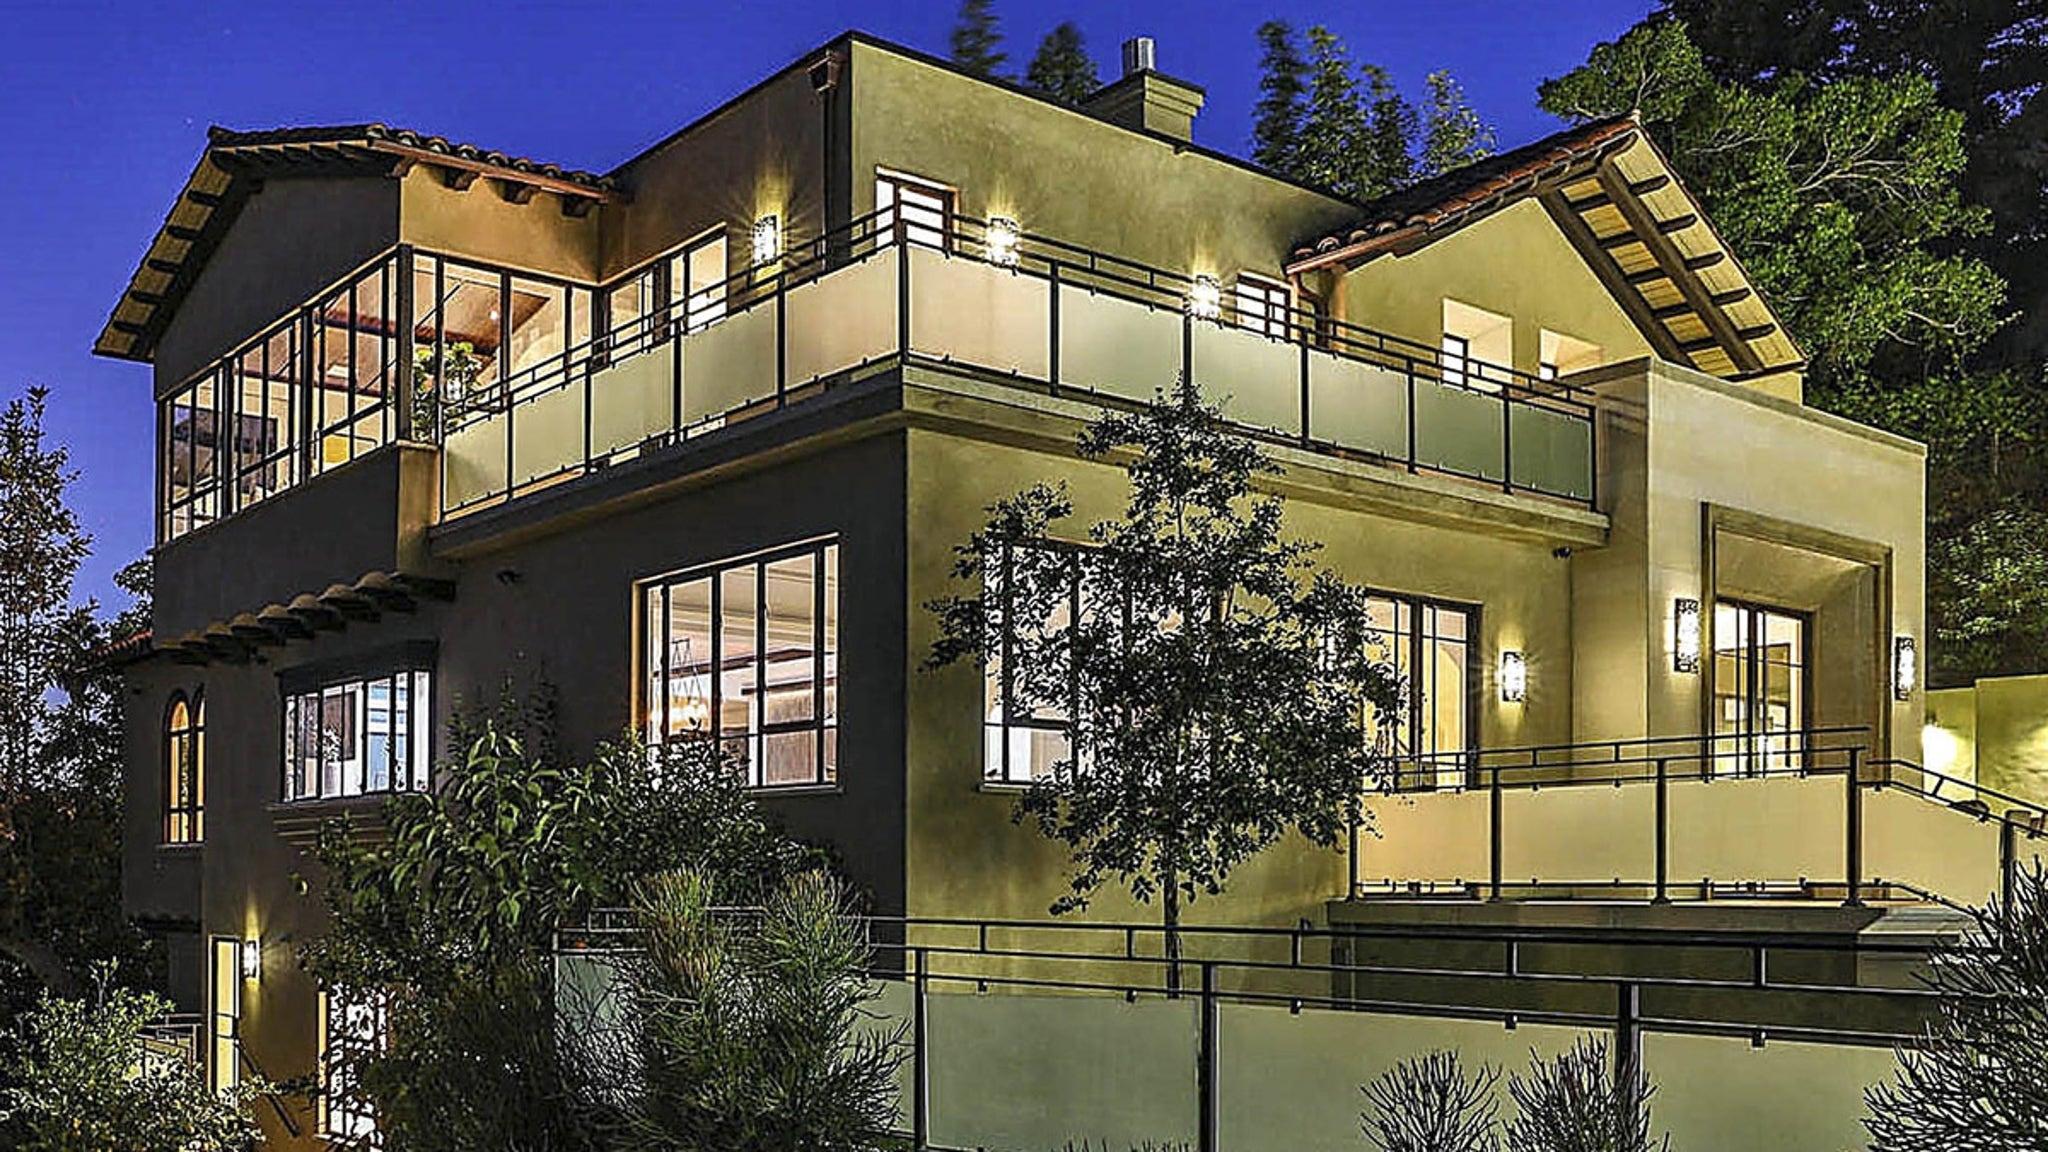 Rihanna Relists Hollywood Hills Mansion for $7.8 Million